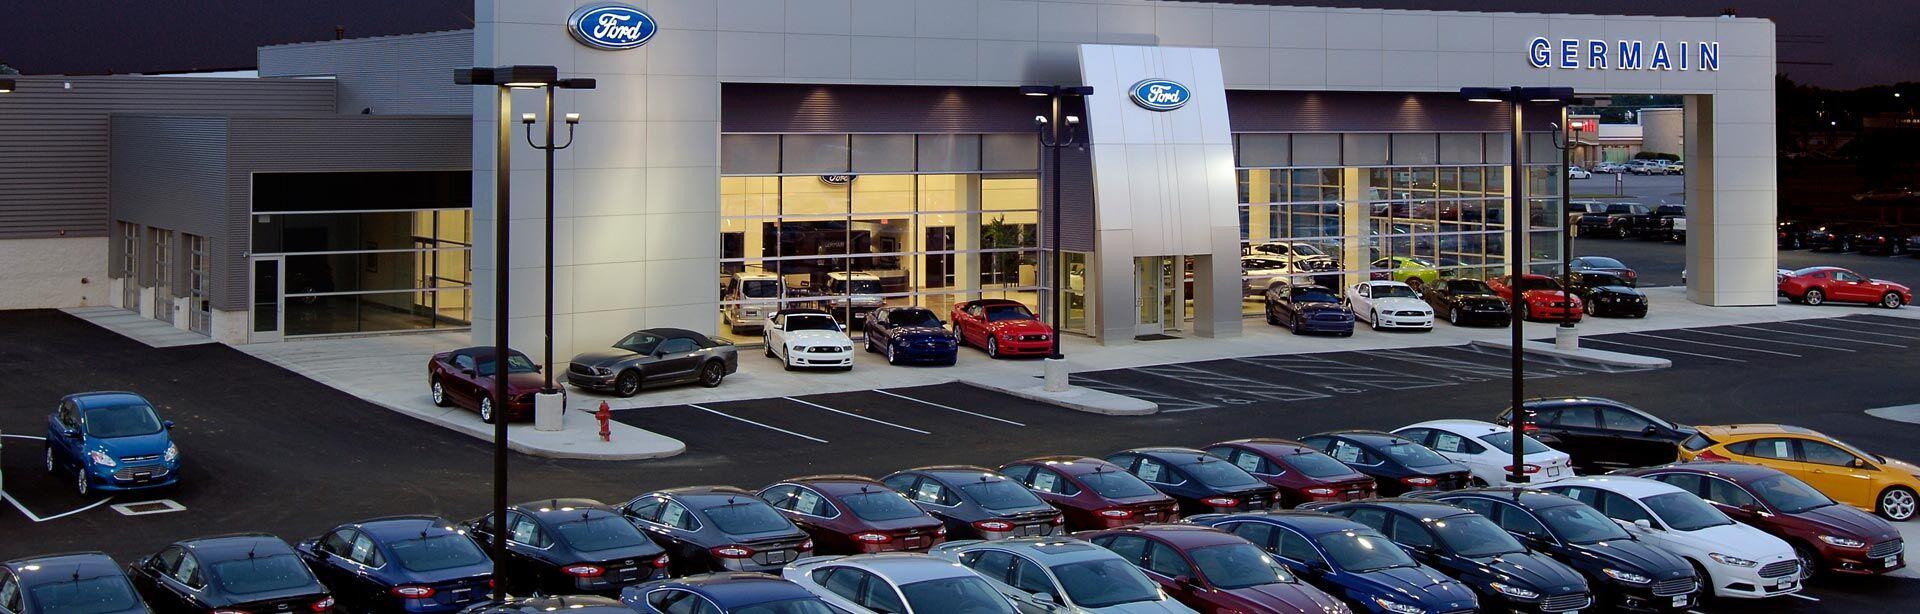 Germain Ford Columbus OH & Ford Lexus Mazda Nissan Dealerships Columbus OH | Used Cars ... markmcfarlin.com